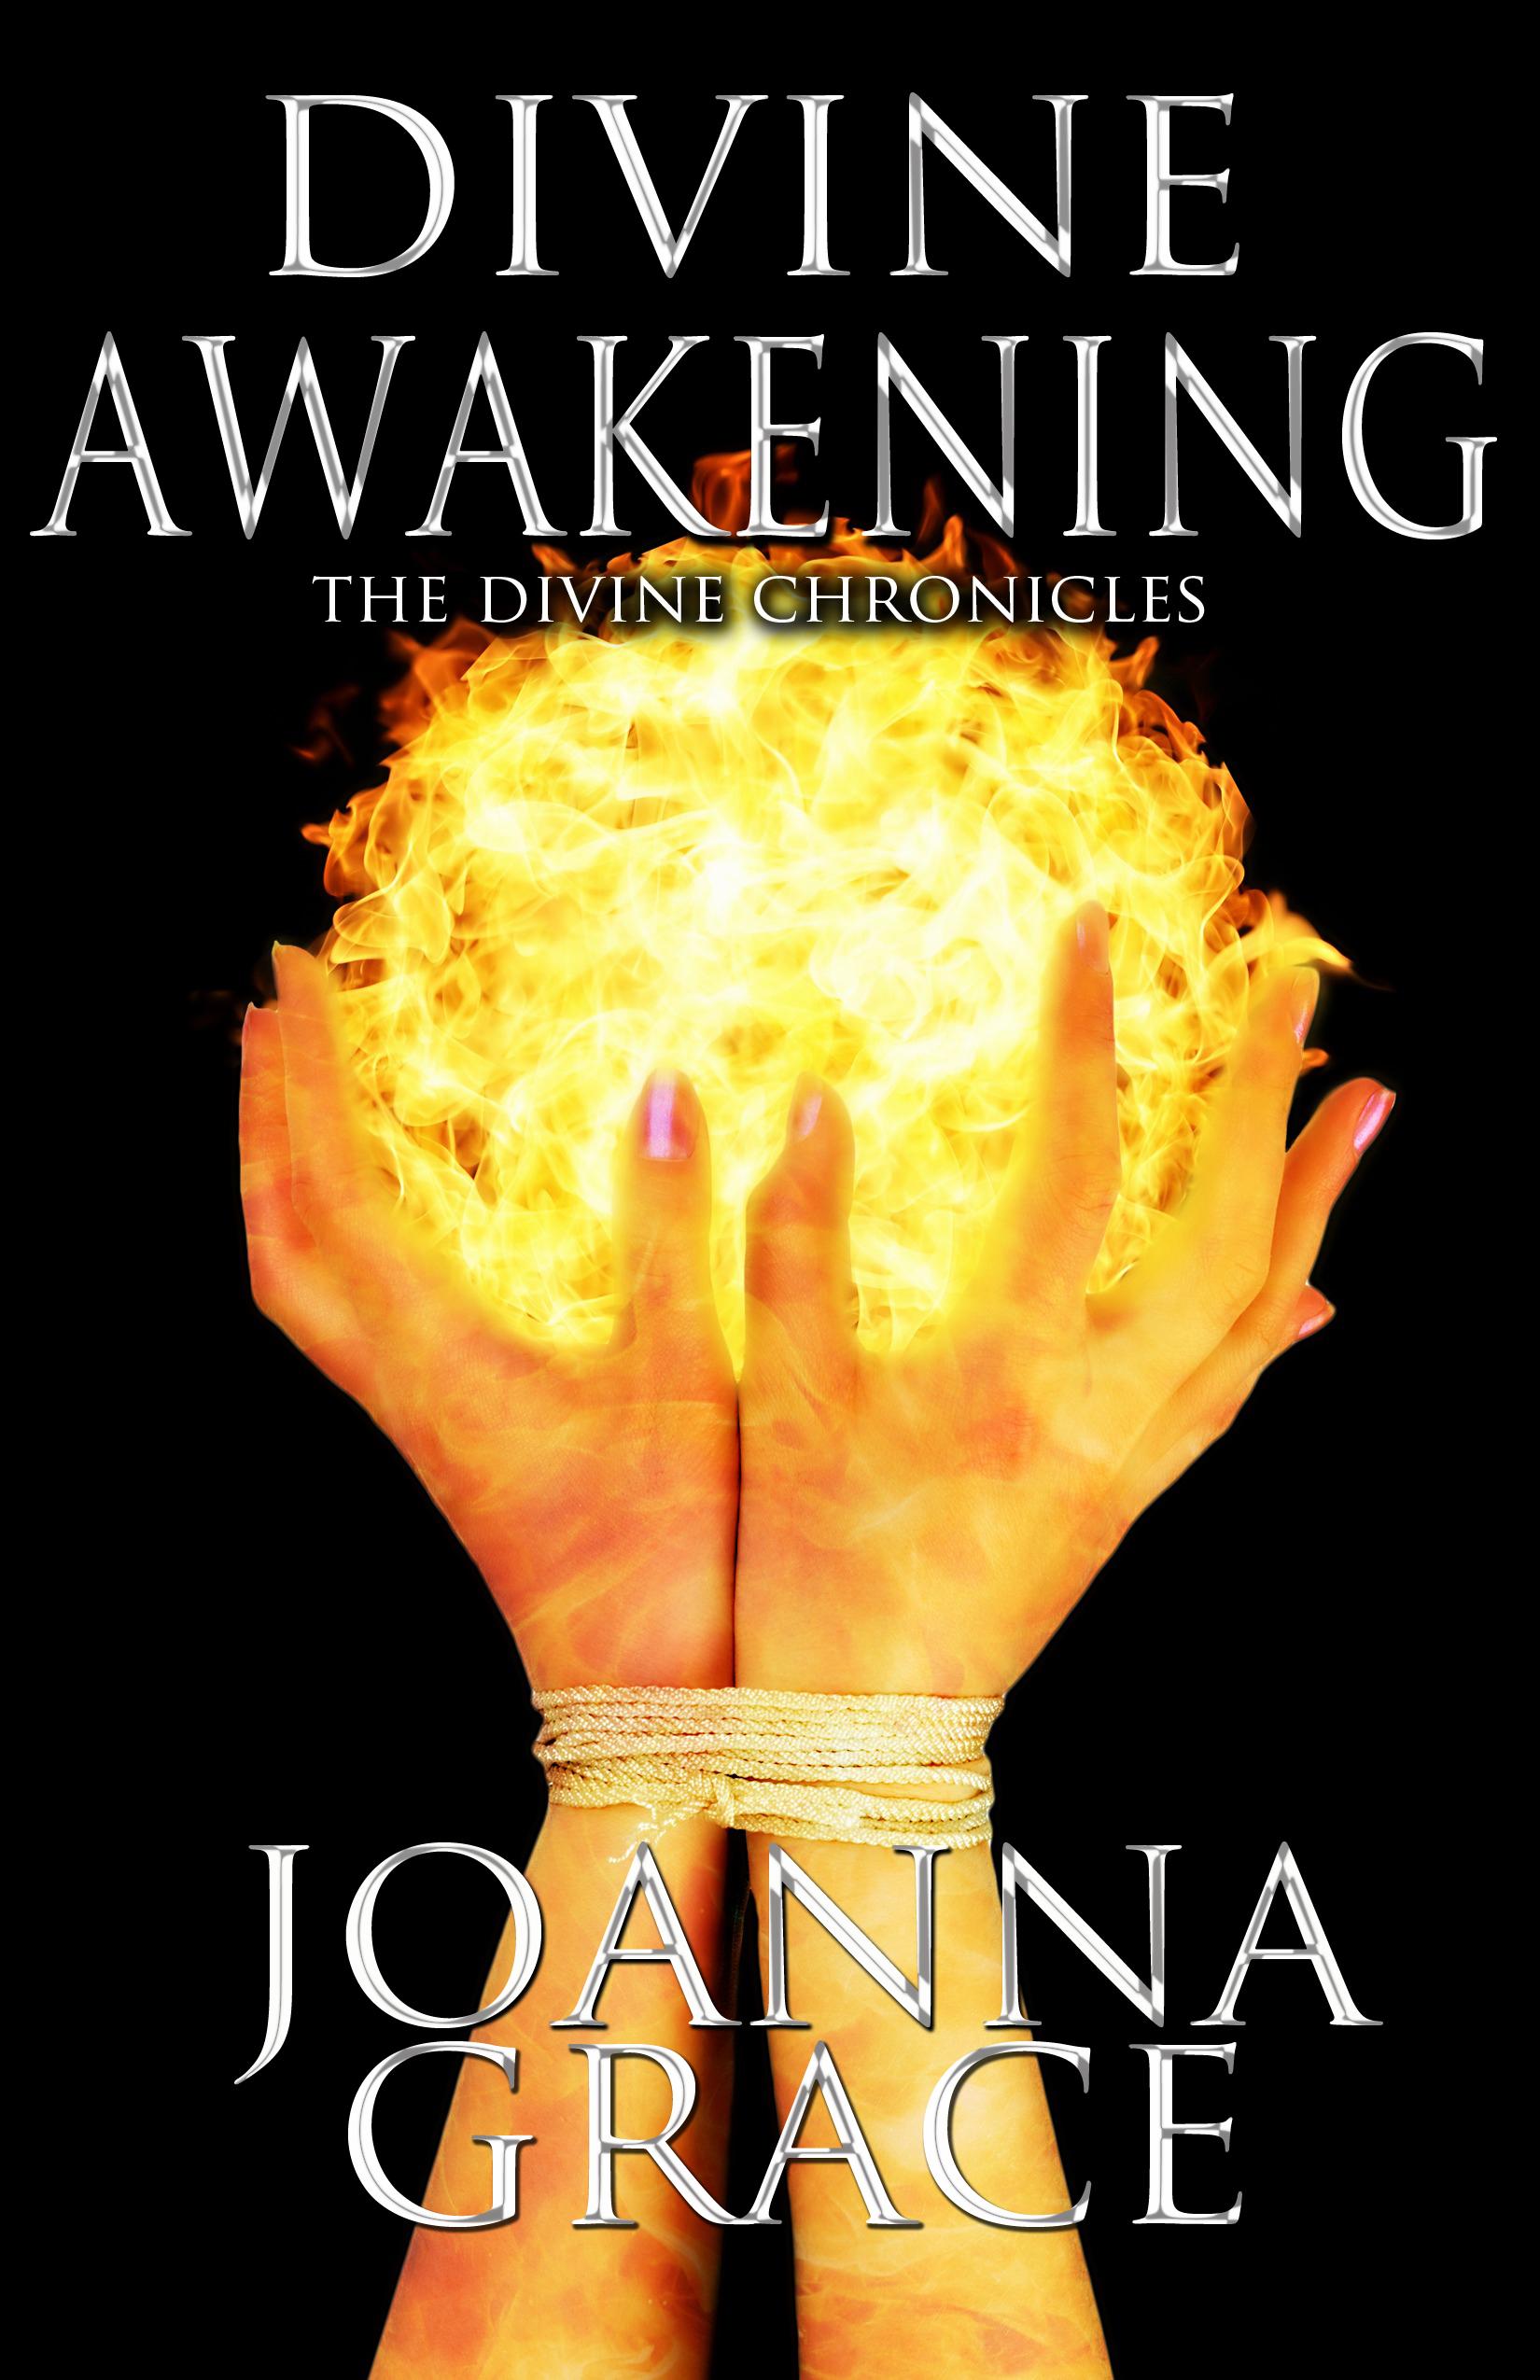 Divine Awakening JoAnna Grace